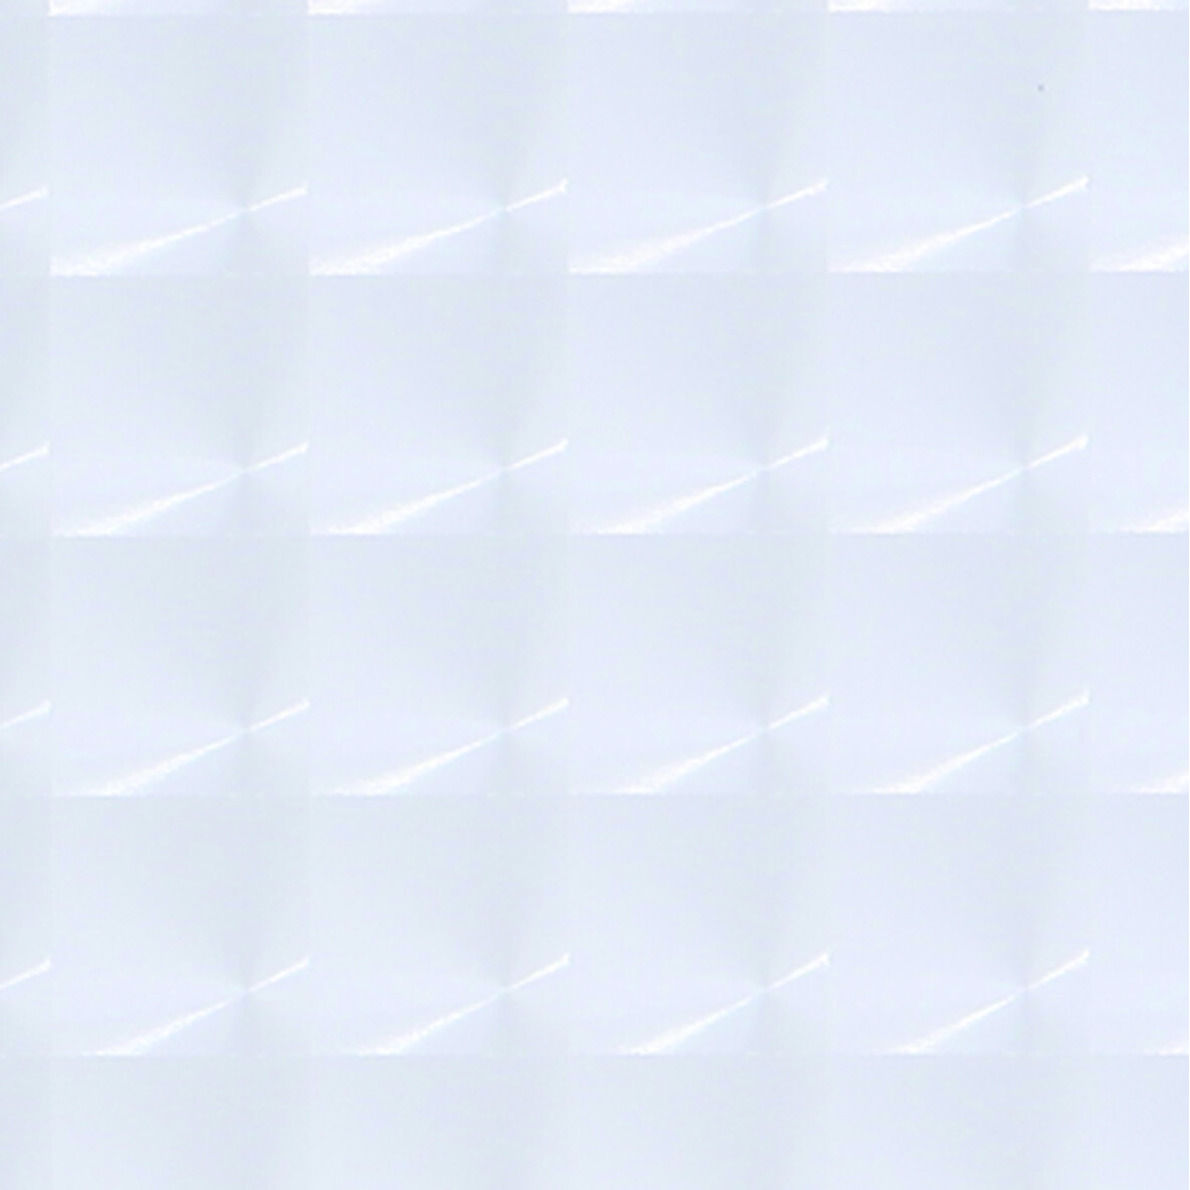 Raamfolie vierkanten semi transparant 45 cm x 2 meter zelfklevend